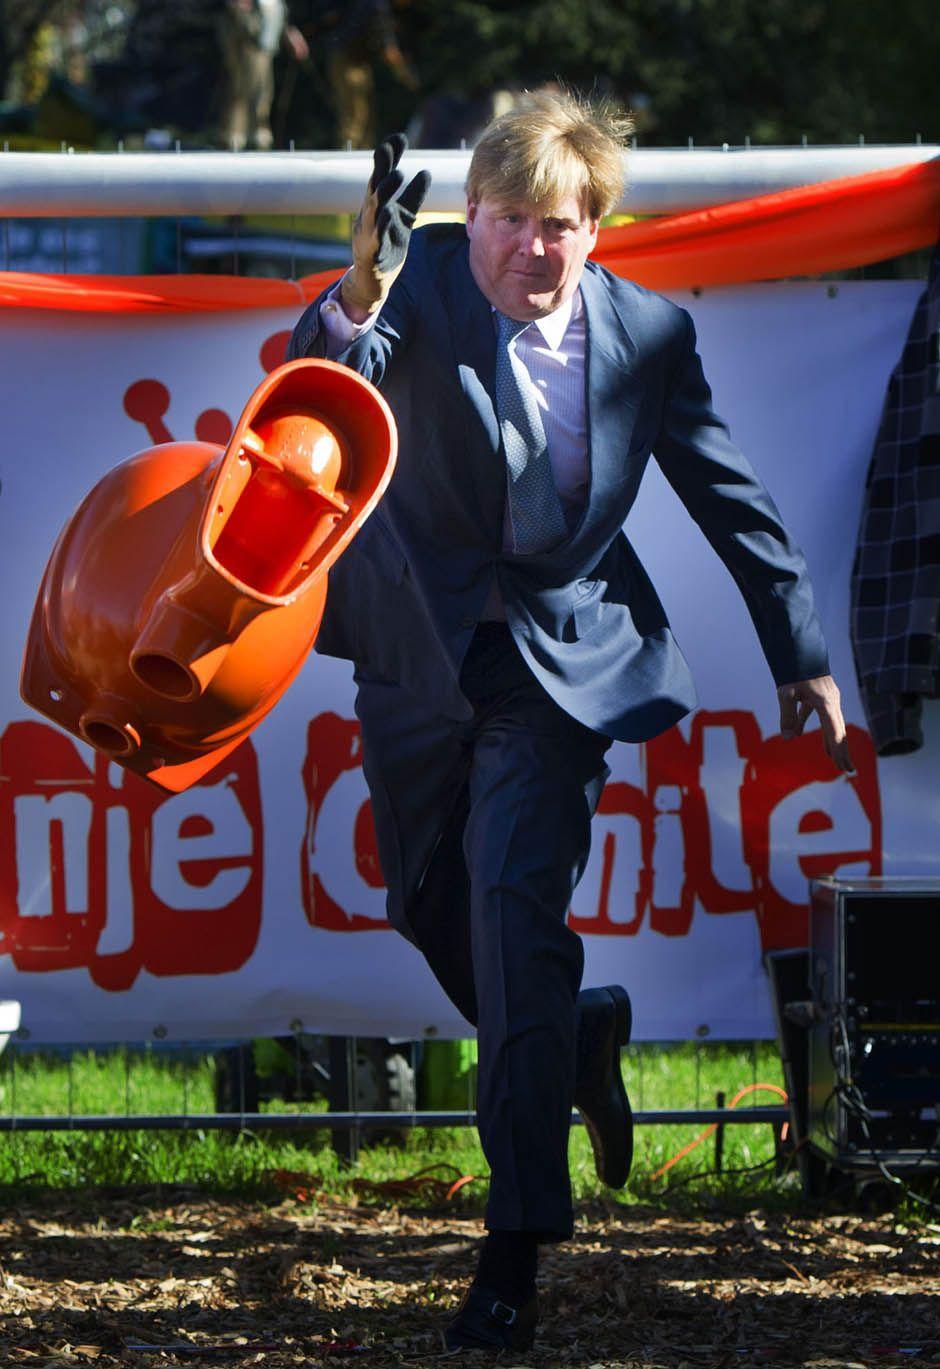 Willem Alexander Wc Pot.Crown Prince Willem Alexander Ashamed Of A Toilet Throwing